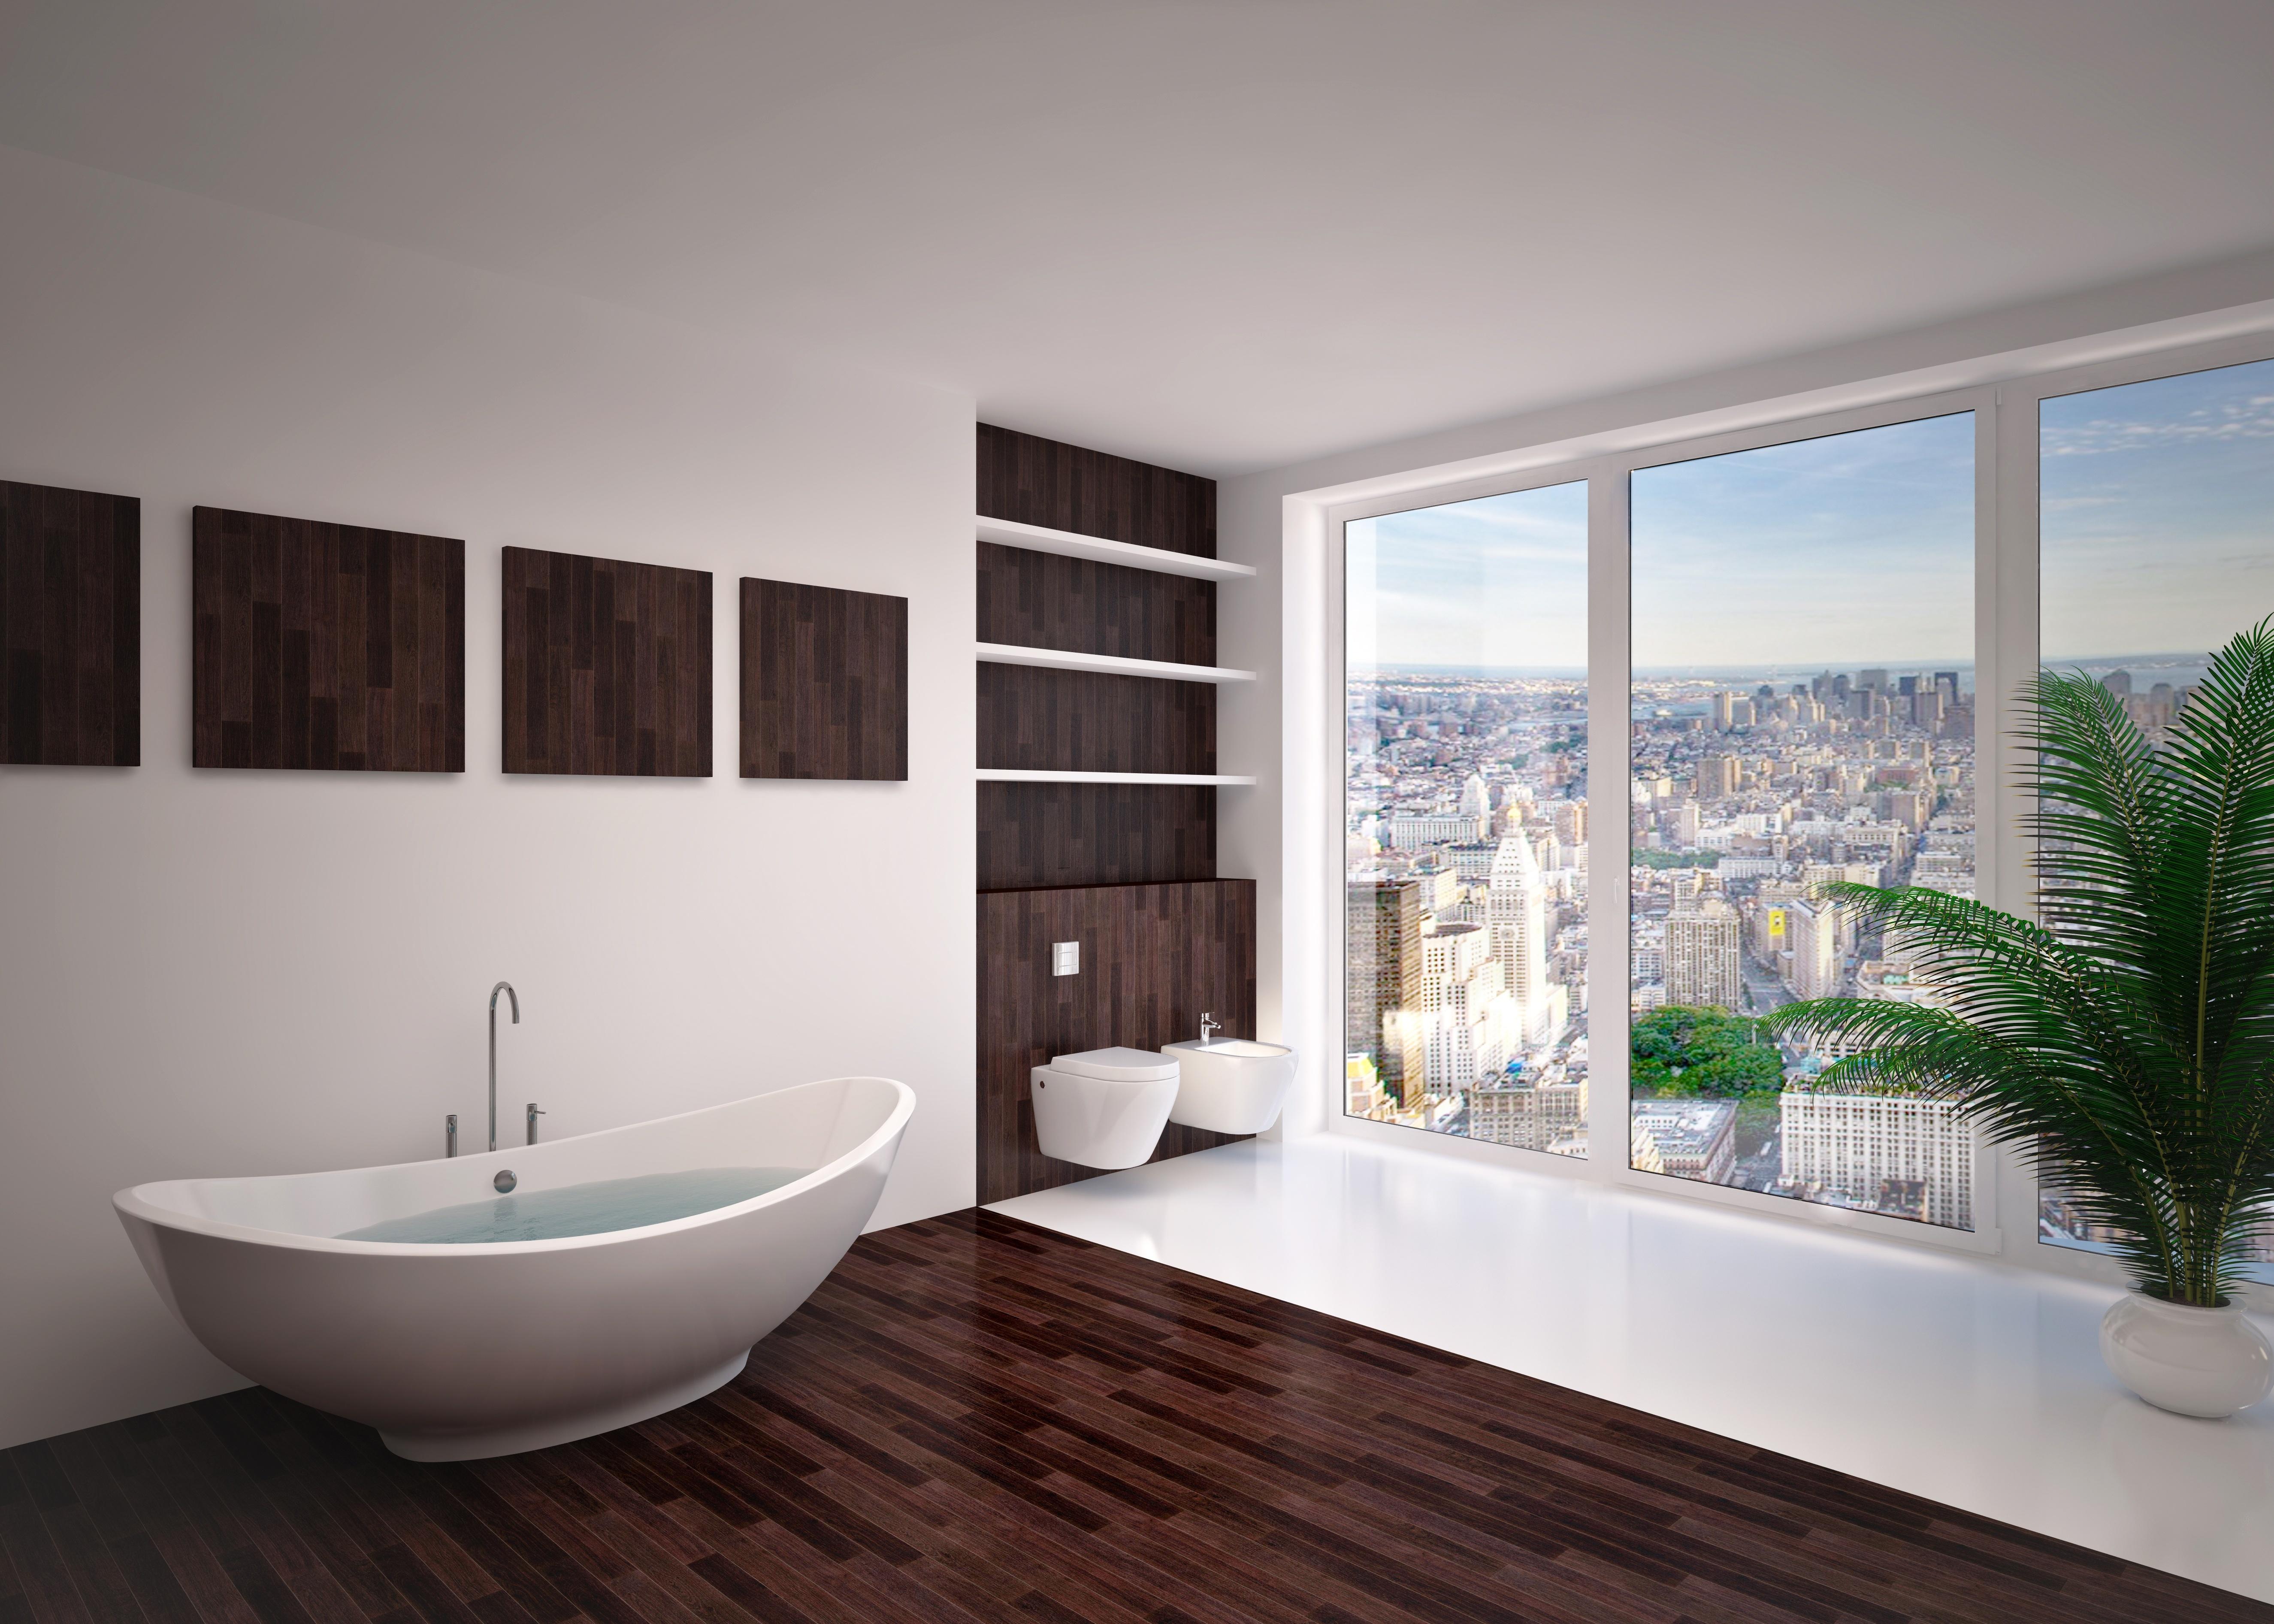 20112528 - modern interior  bathroom in house, apartment